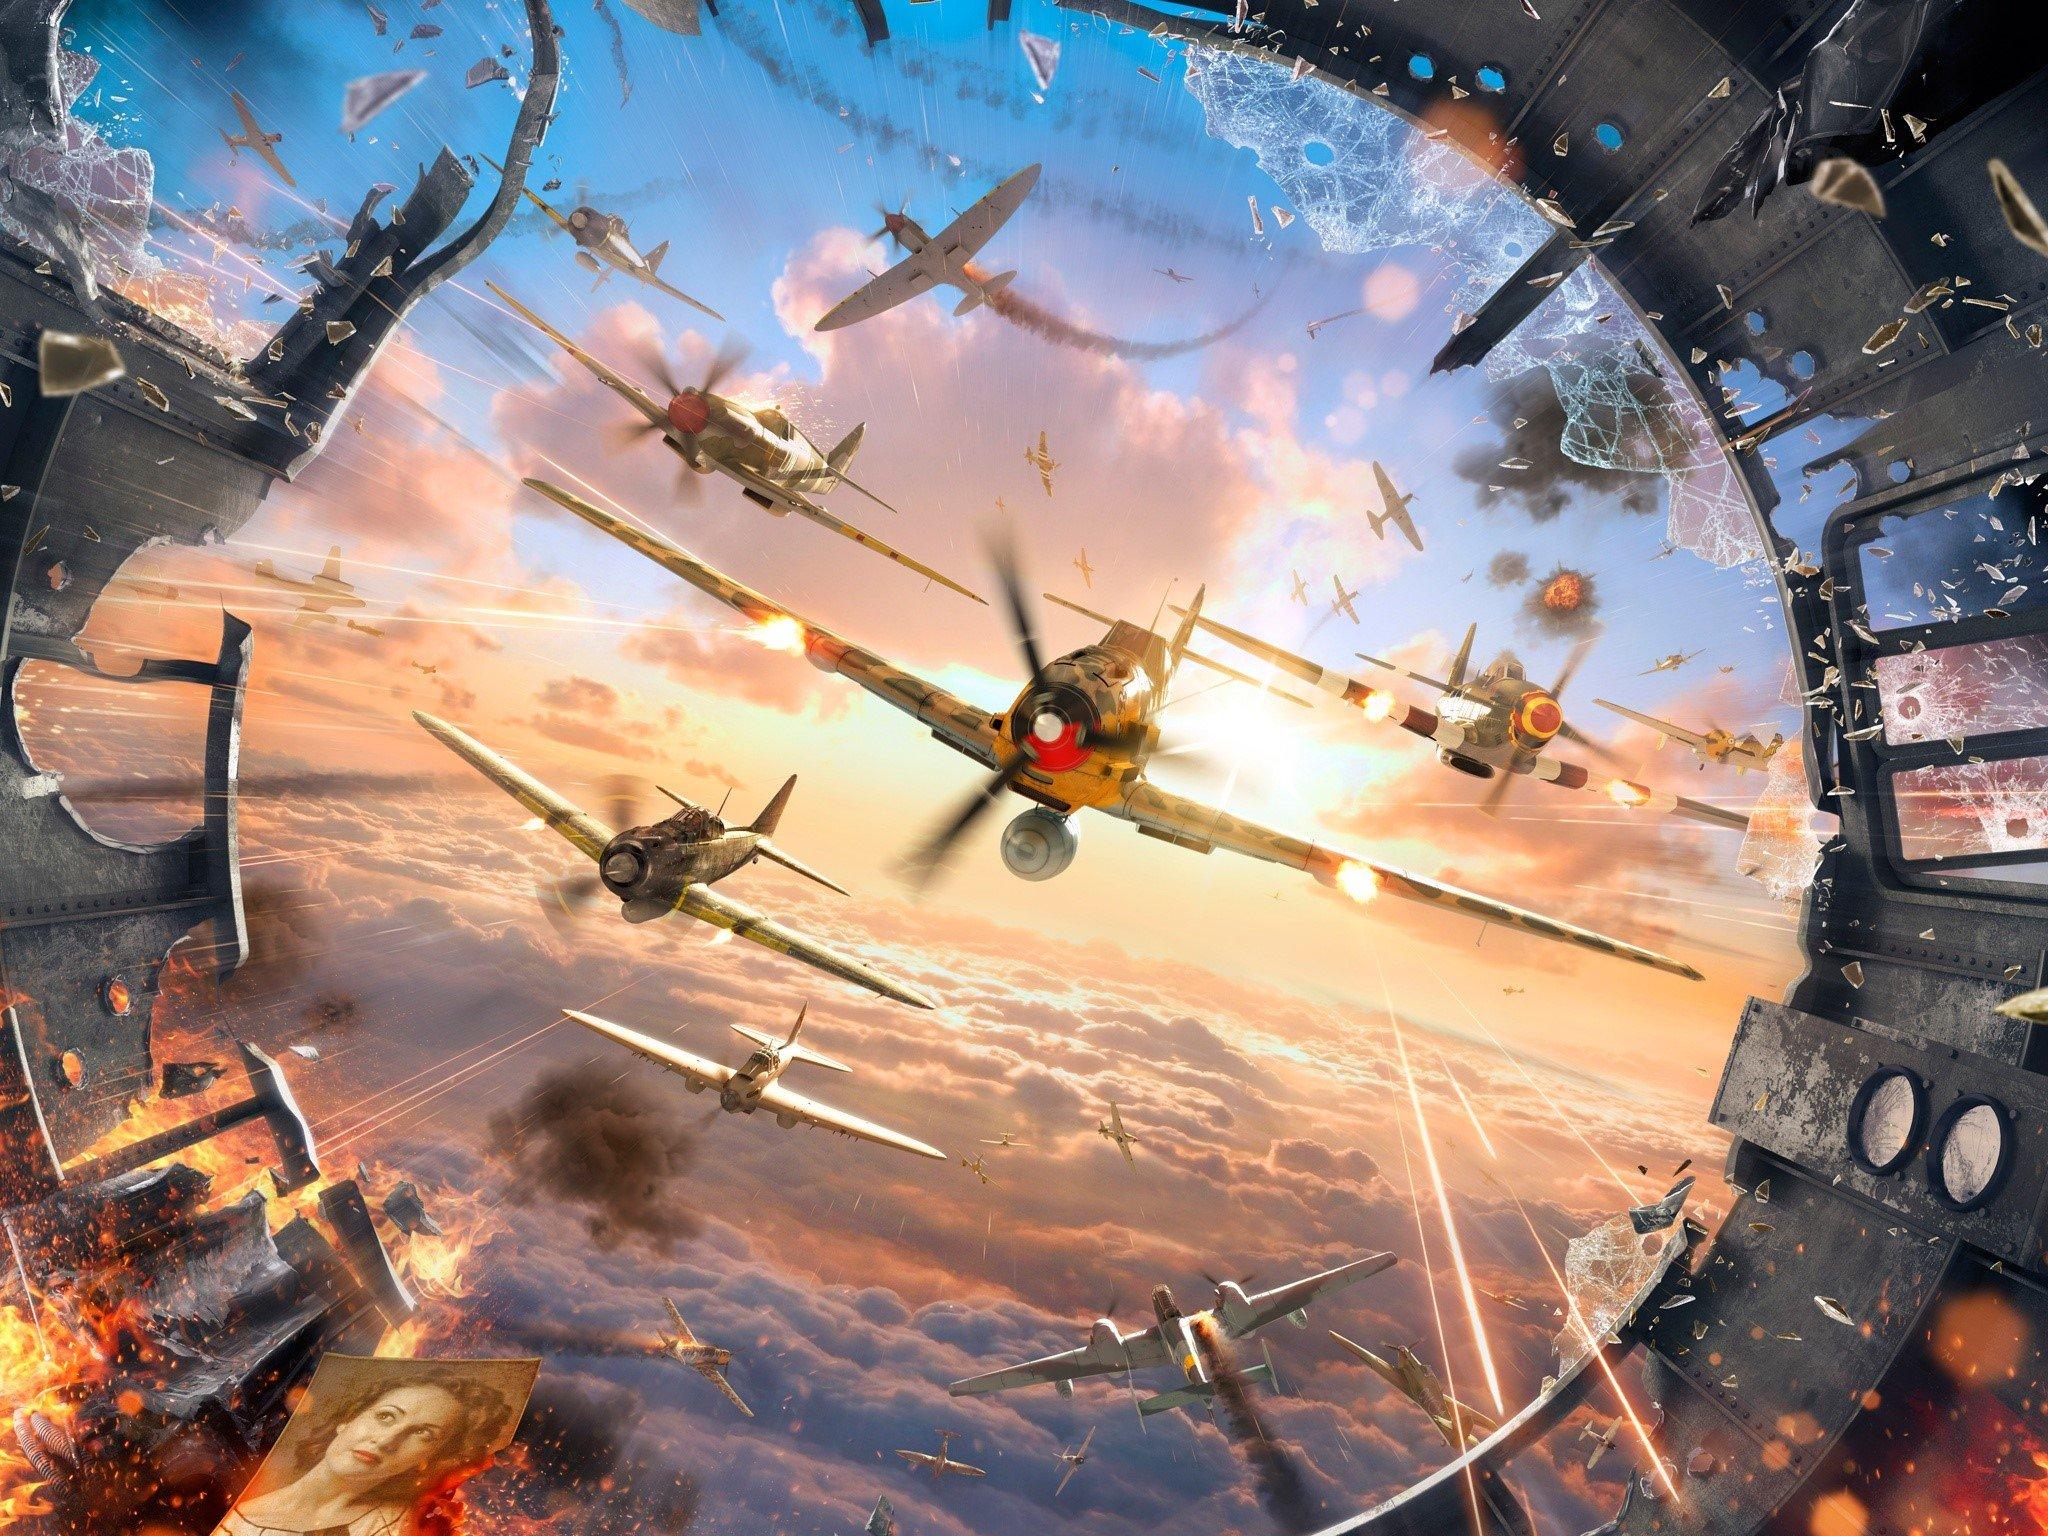 Wallpaper Juego World of warplanes Images